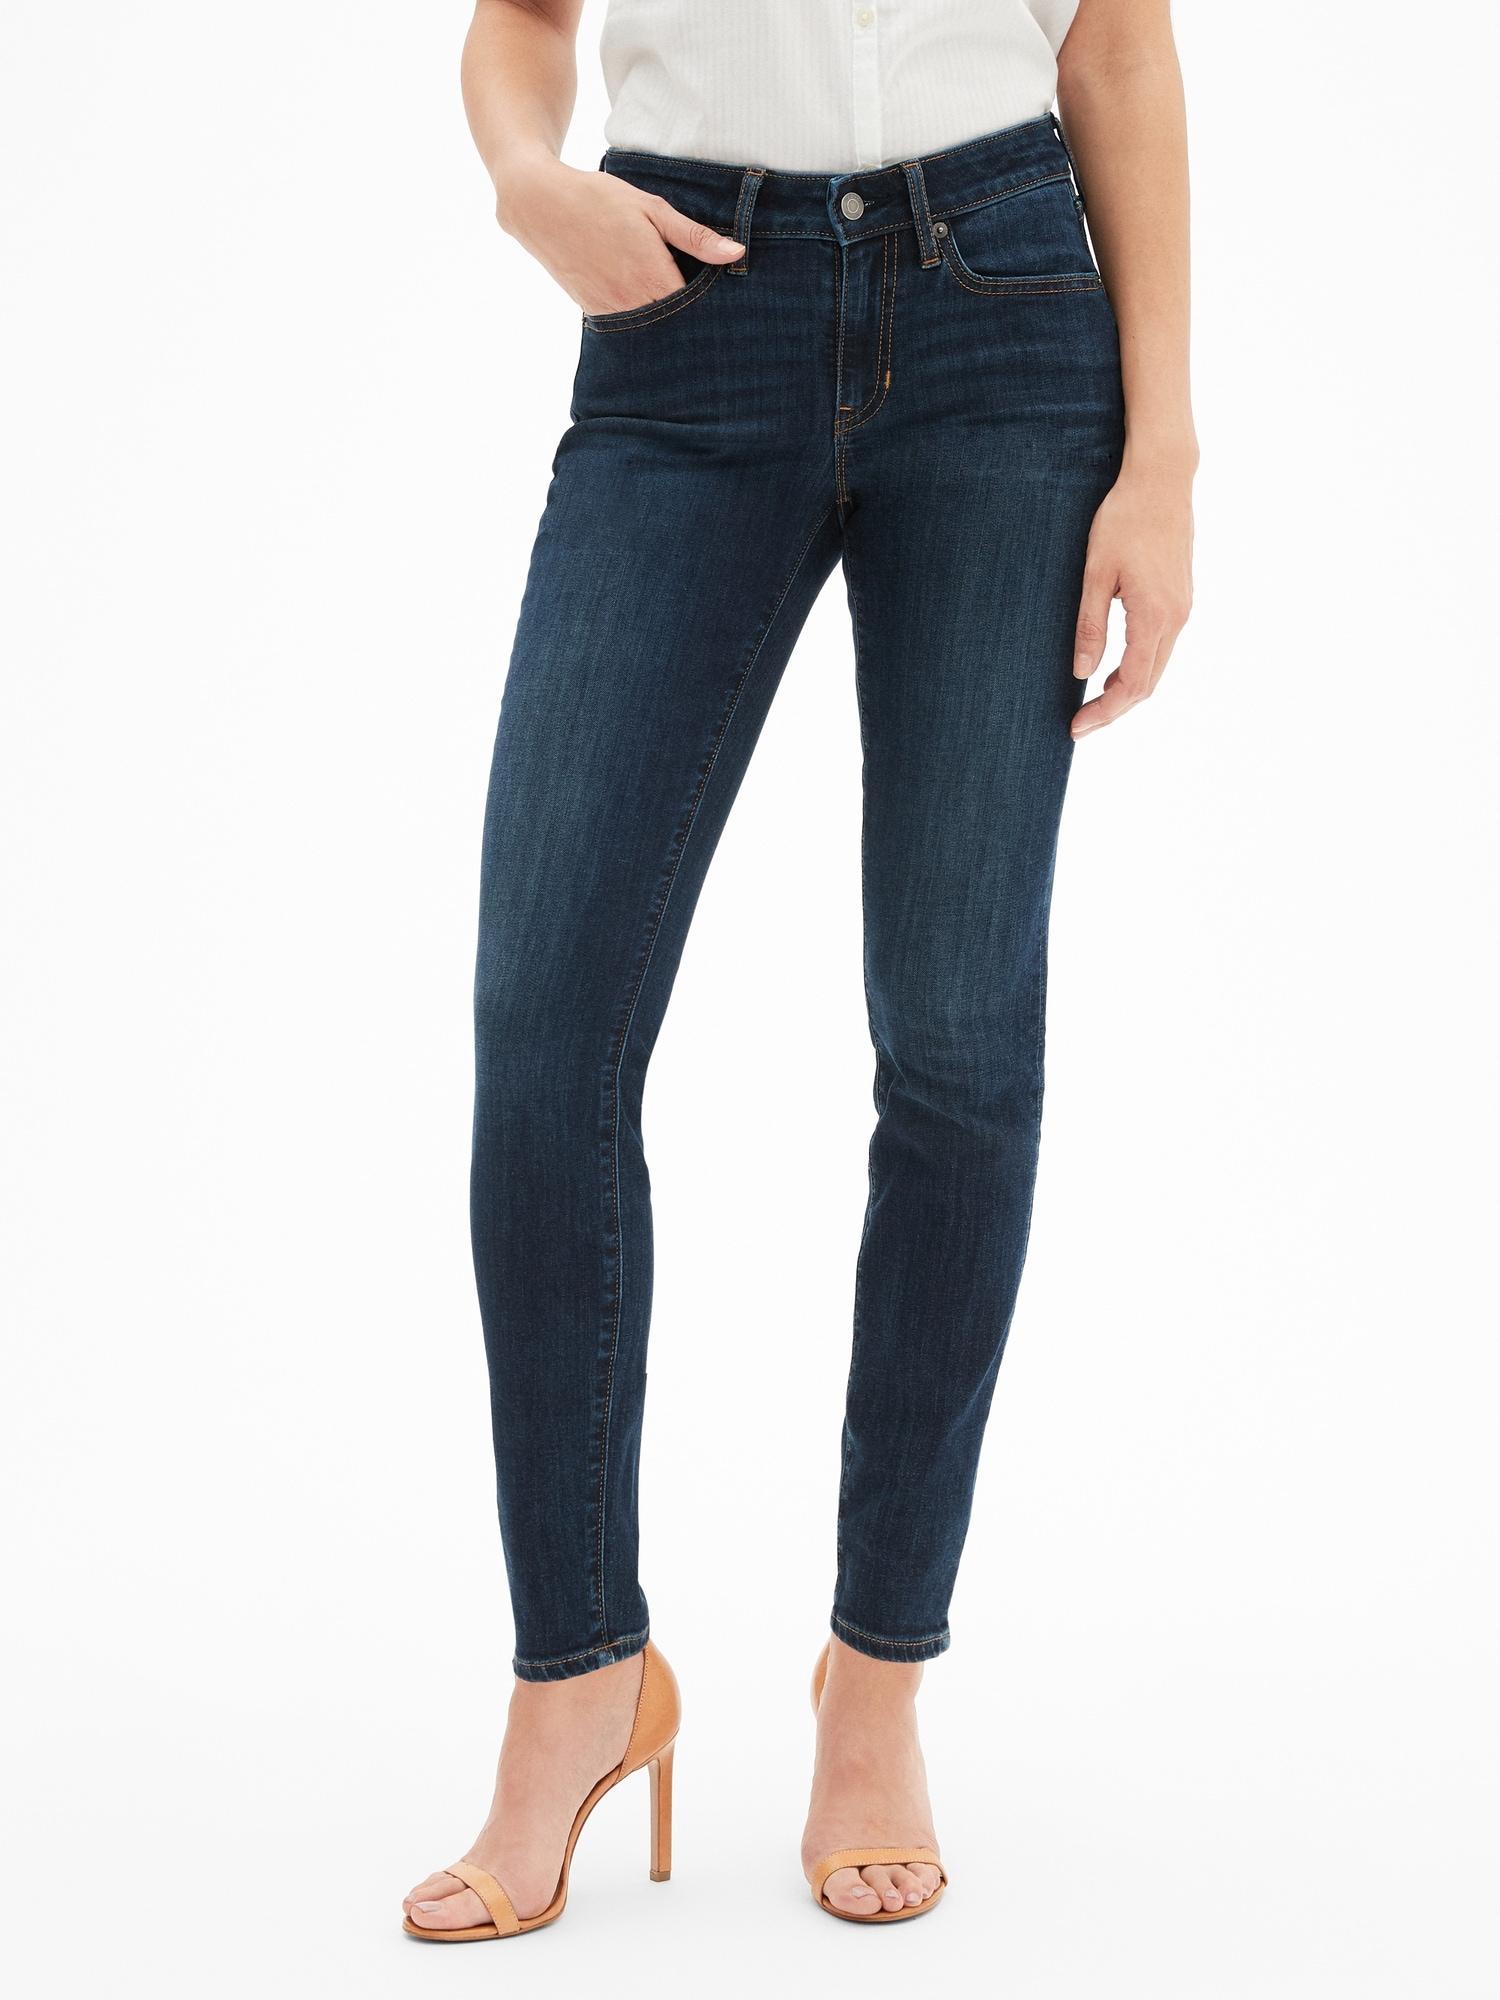 2c817d866a9a0 Lyst - GAP Factory Mid Rise Curvy Legging Skimmer Jeans in Blue